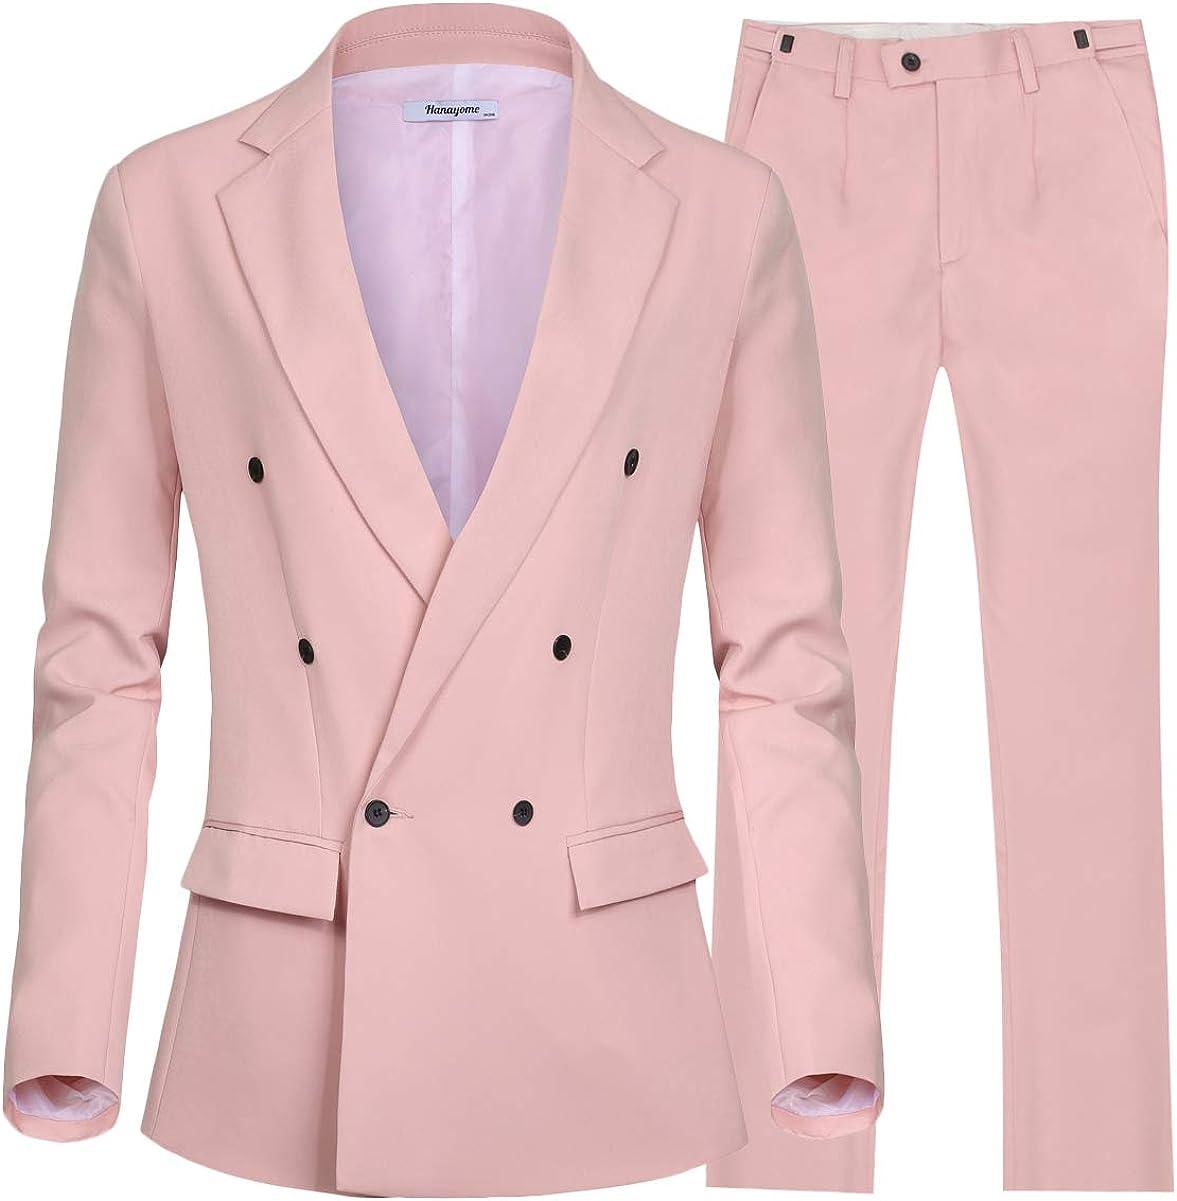 CMDC Women's 2 PC Business Casual Shawl Collar Formal Blazer Suit Pants Sets MI35